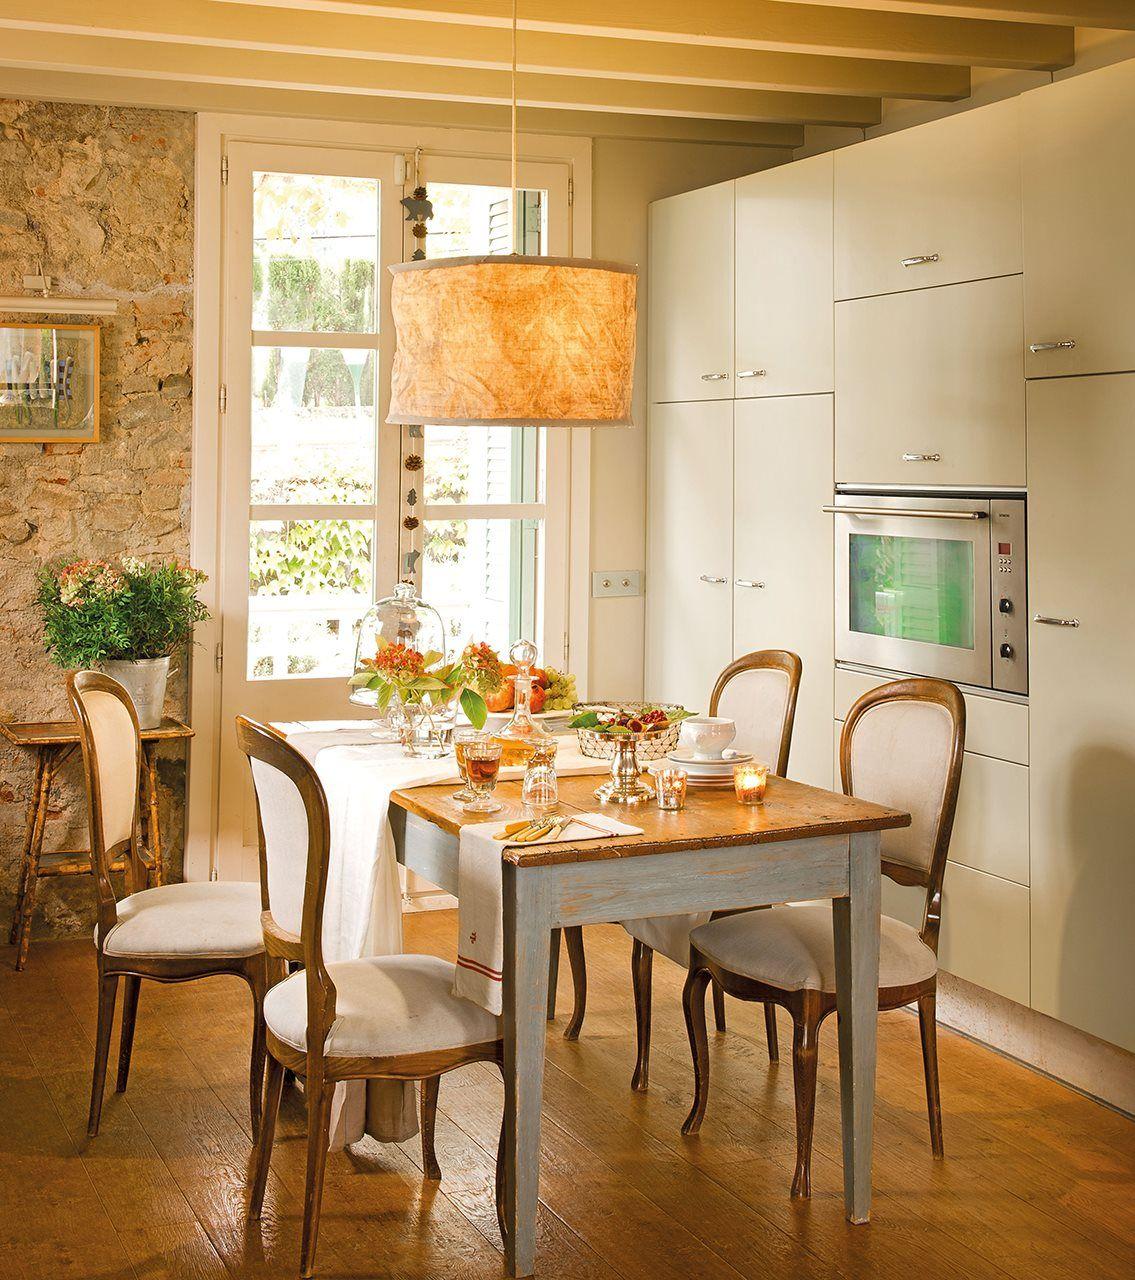 3 cocinas abiertas muy bien integradas | Pinterest | Open kitchens ...